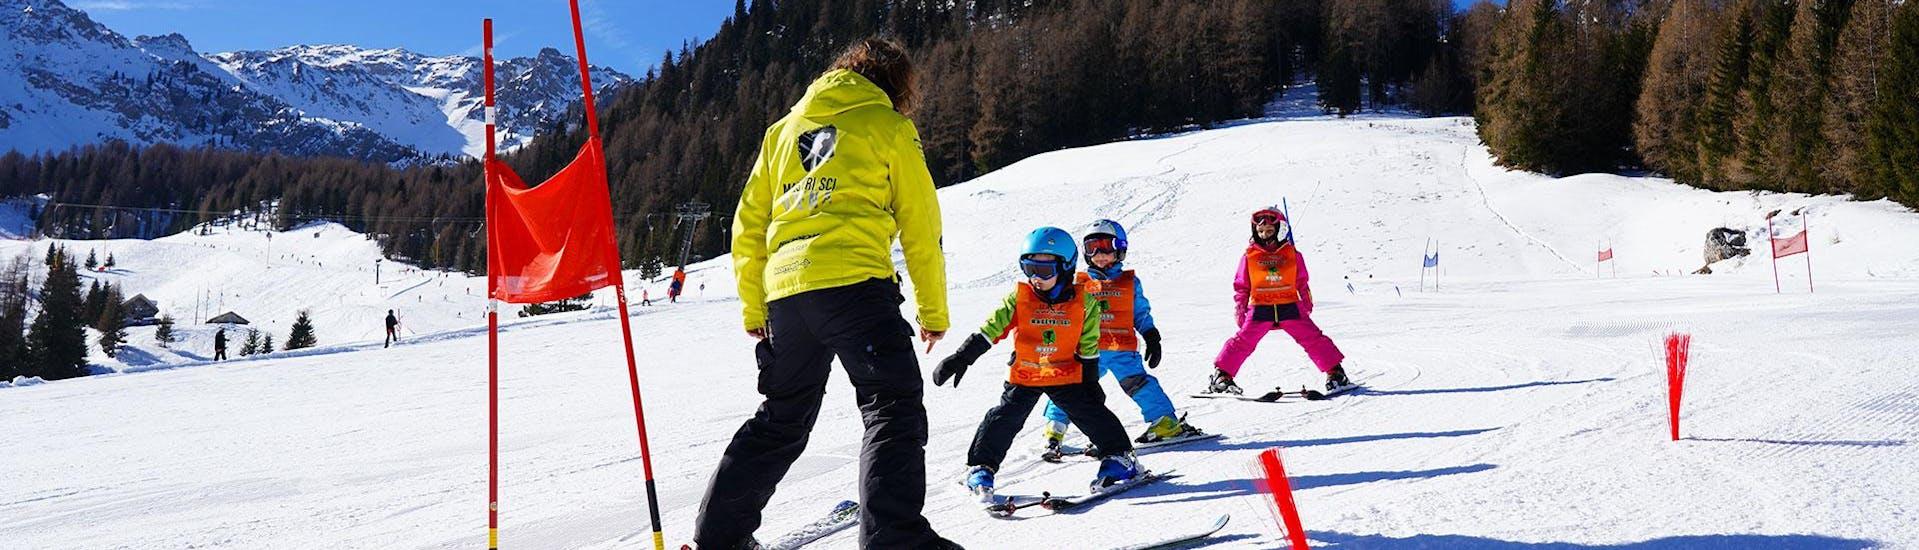 kids-ski-lessons-3-5-y-for-beginners-maestri-di-sci-moena-hero